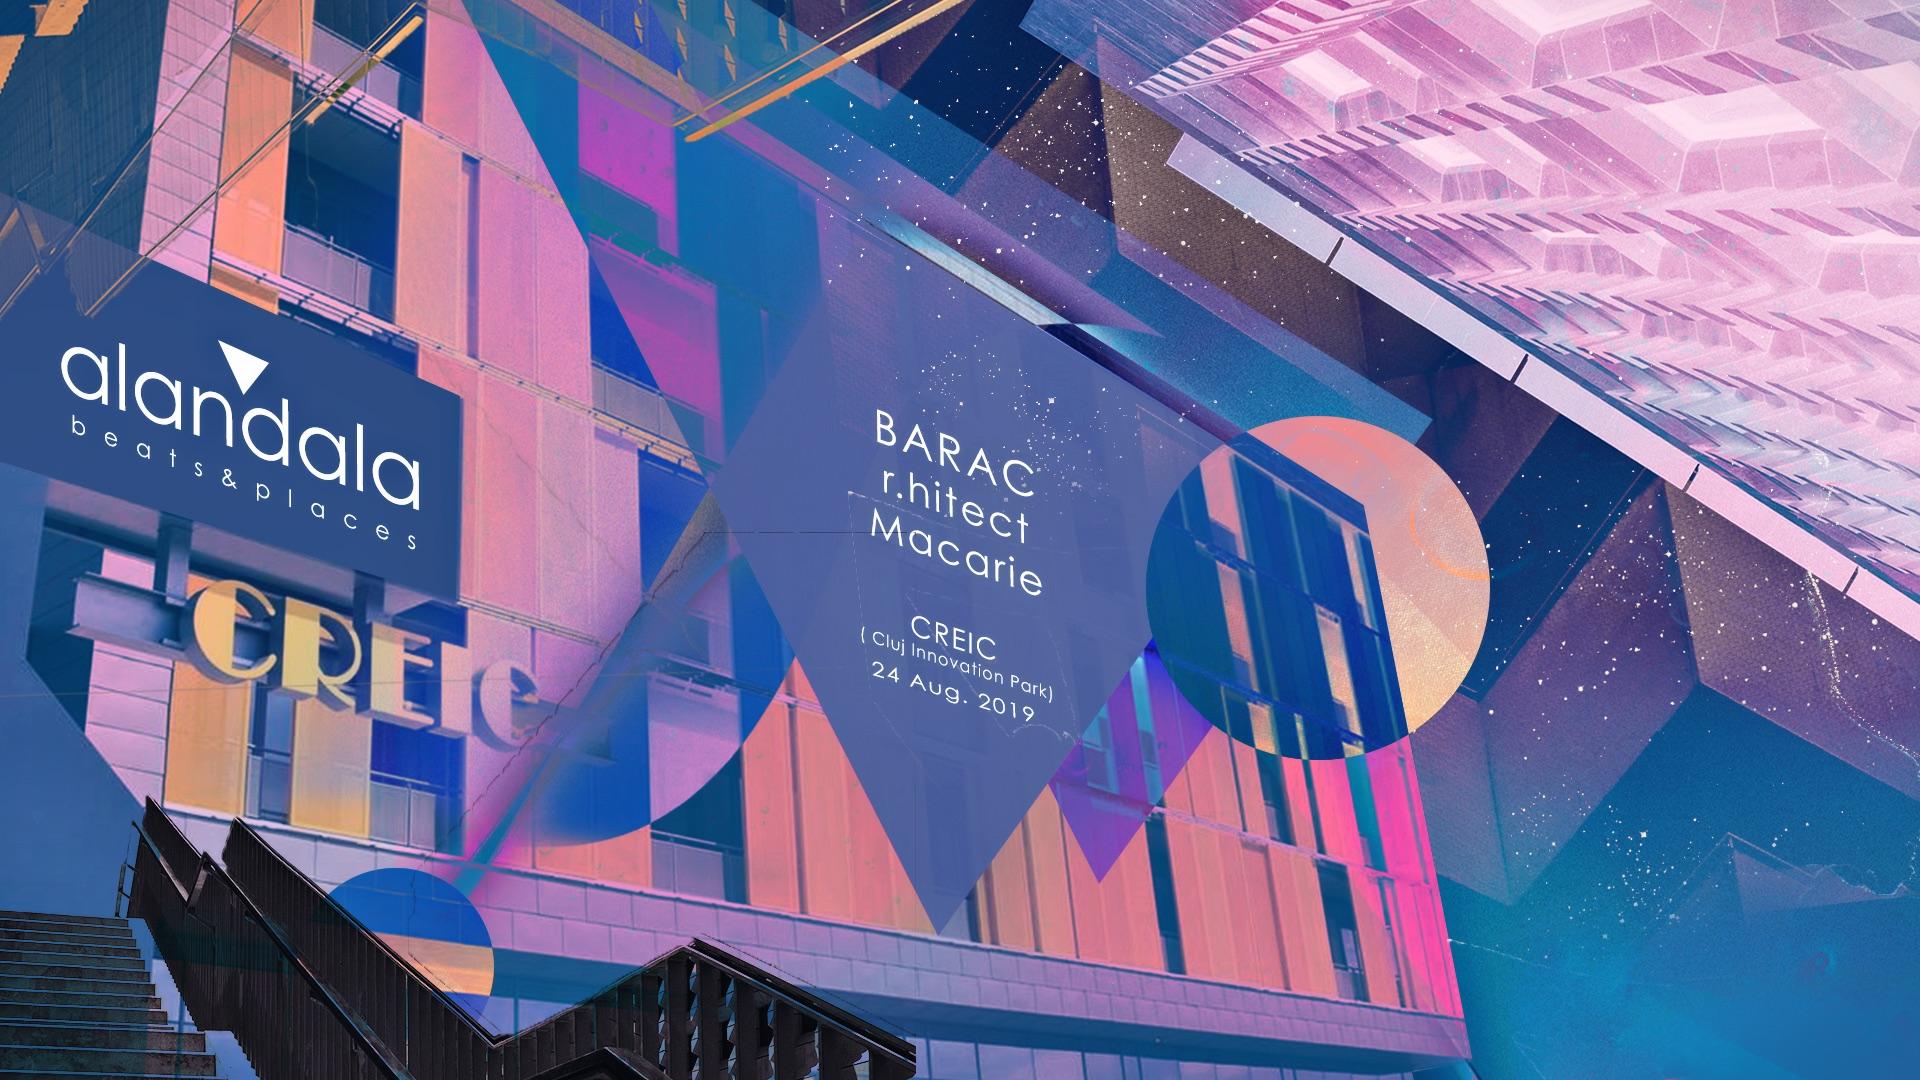 Alandala ▼ Takeover [inovation_park] w/ BARAC